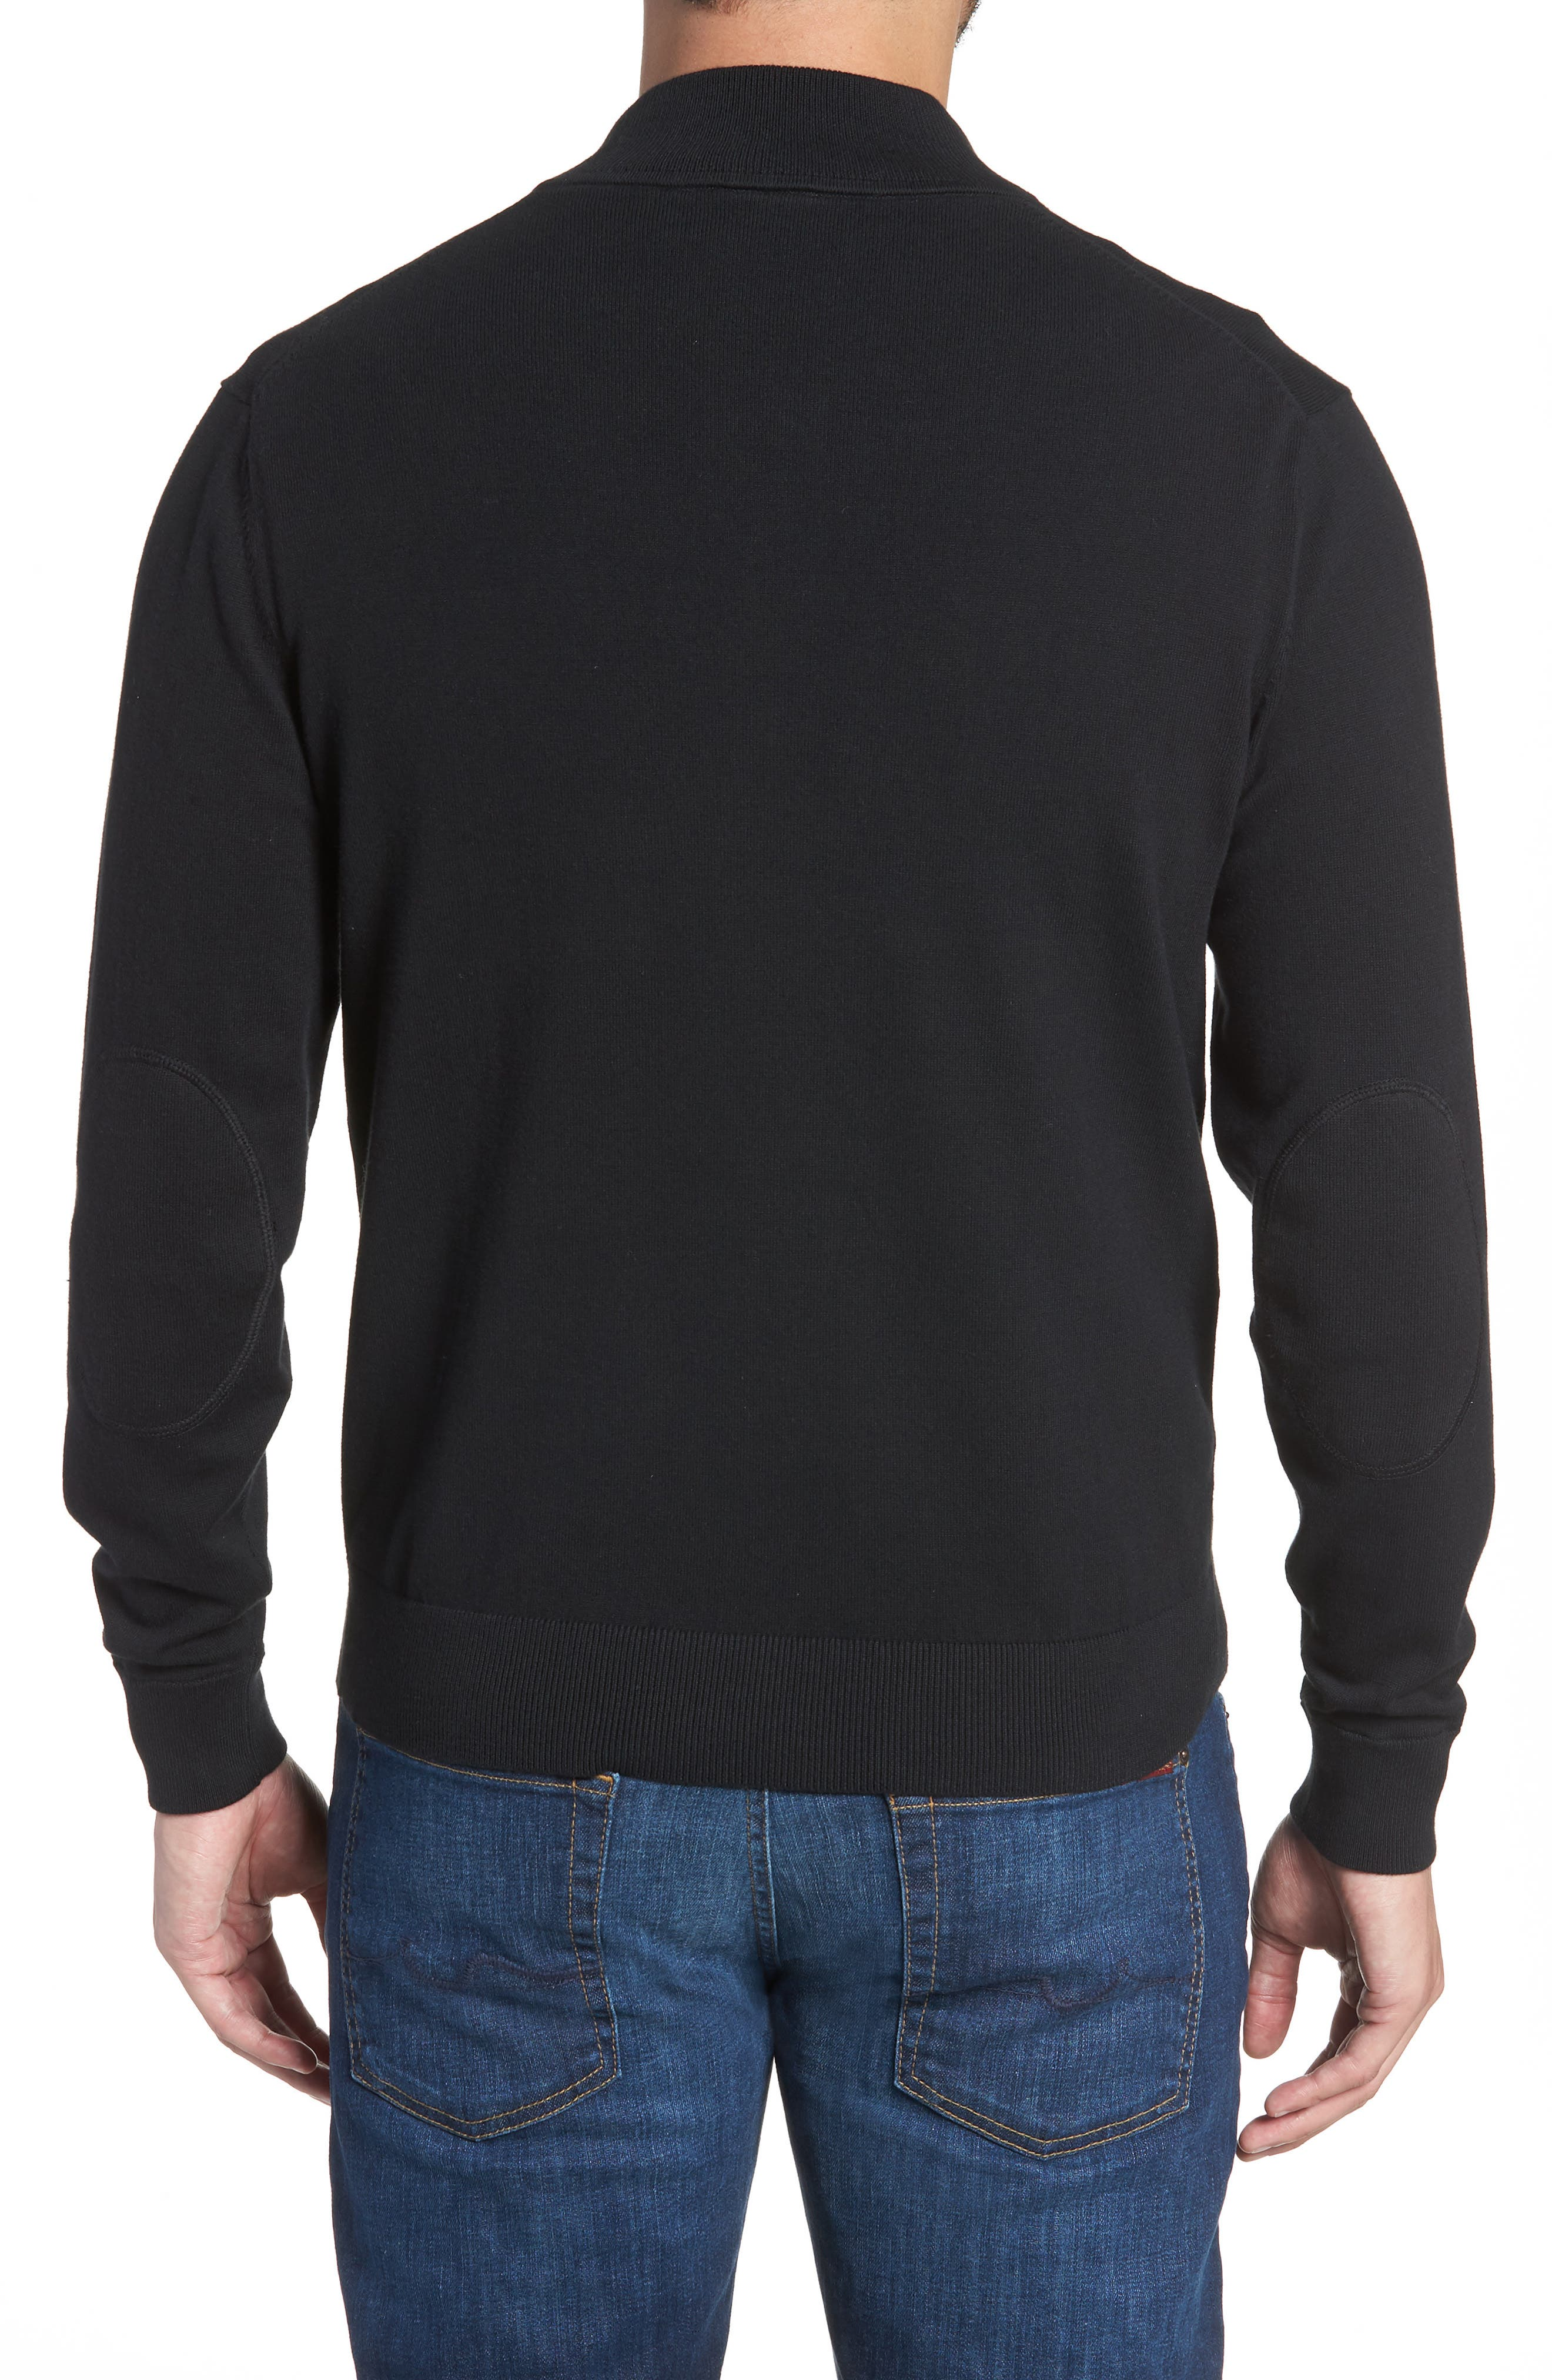 Cleveland Browns - Lakemont Regular Fit Quarter Zip Sweater,                             Alternate thumbnail 2, color,                             BLACK